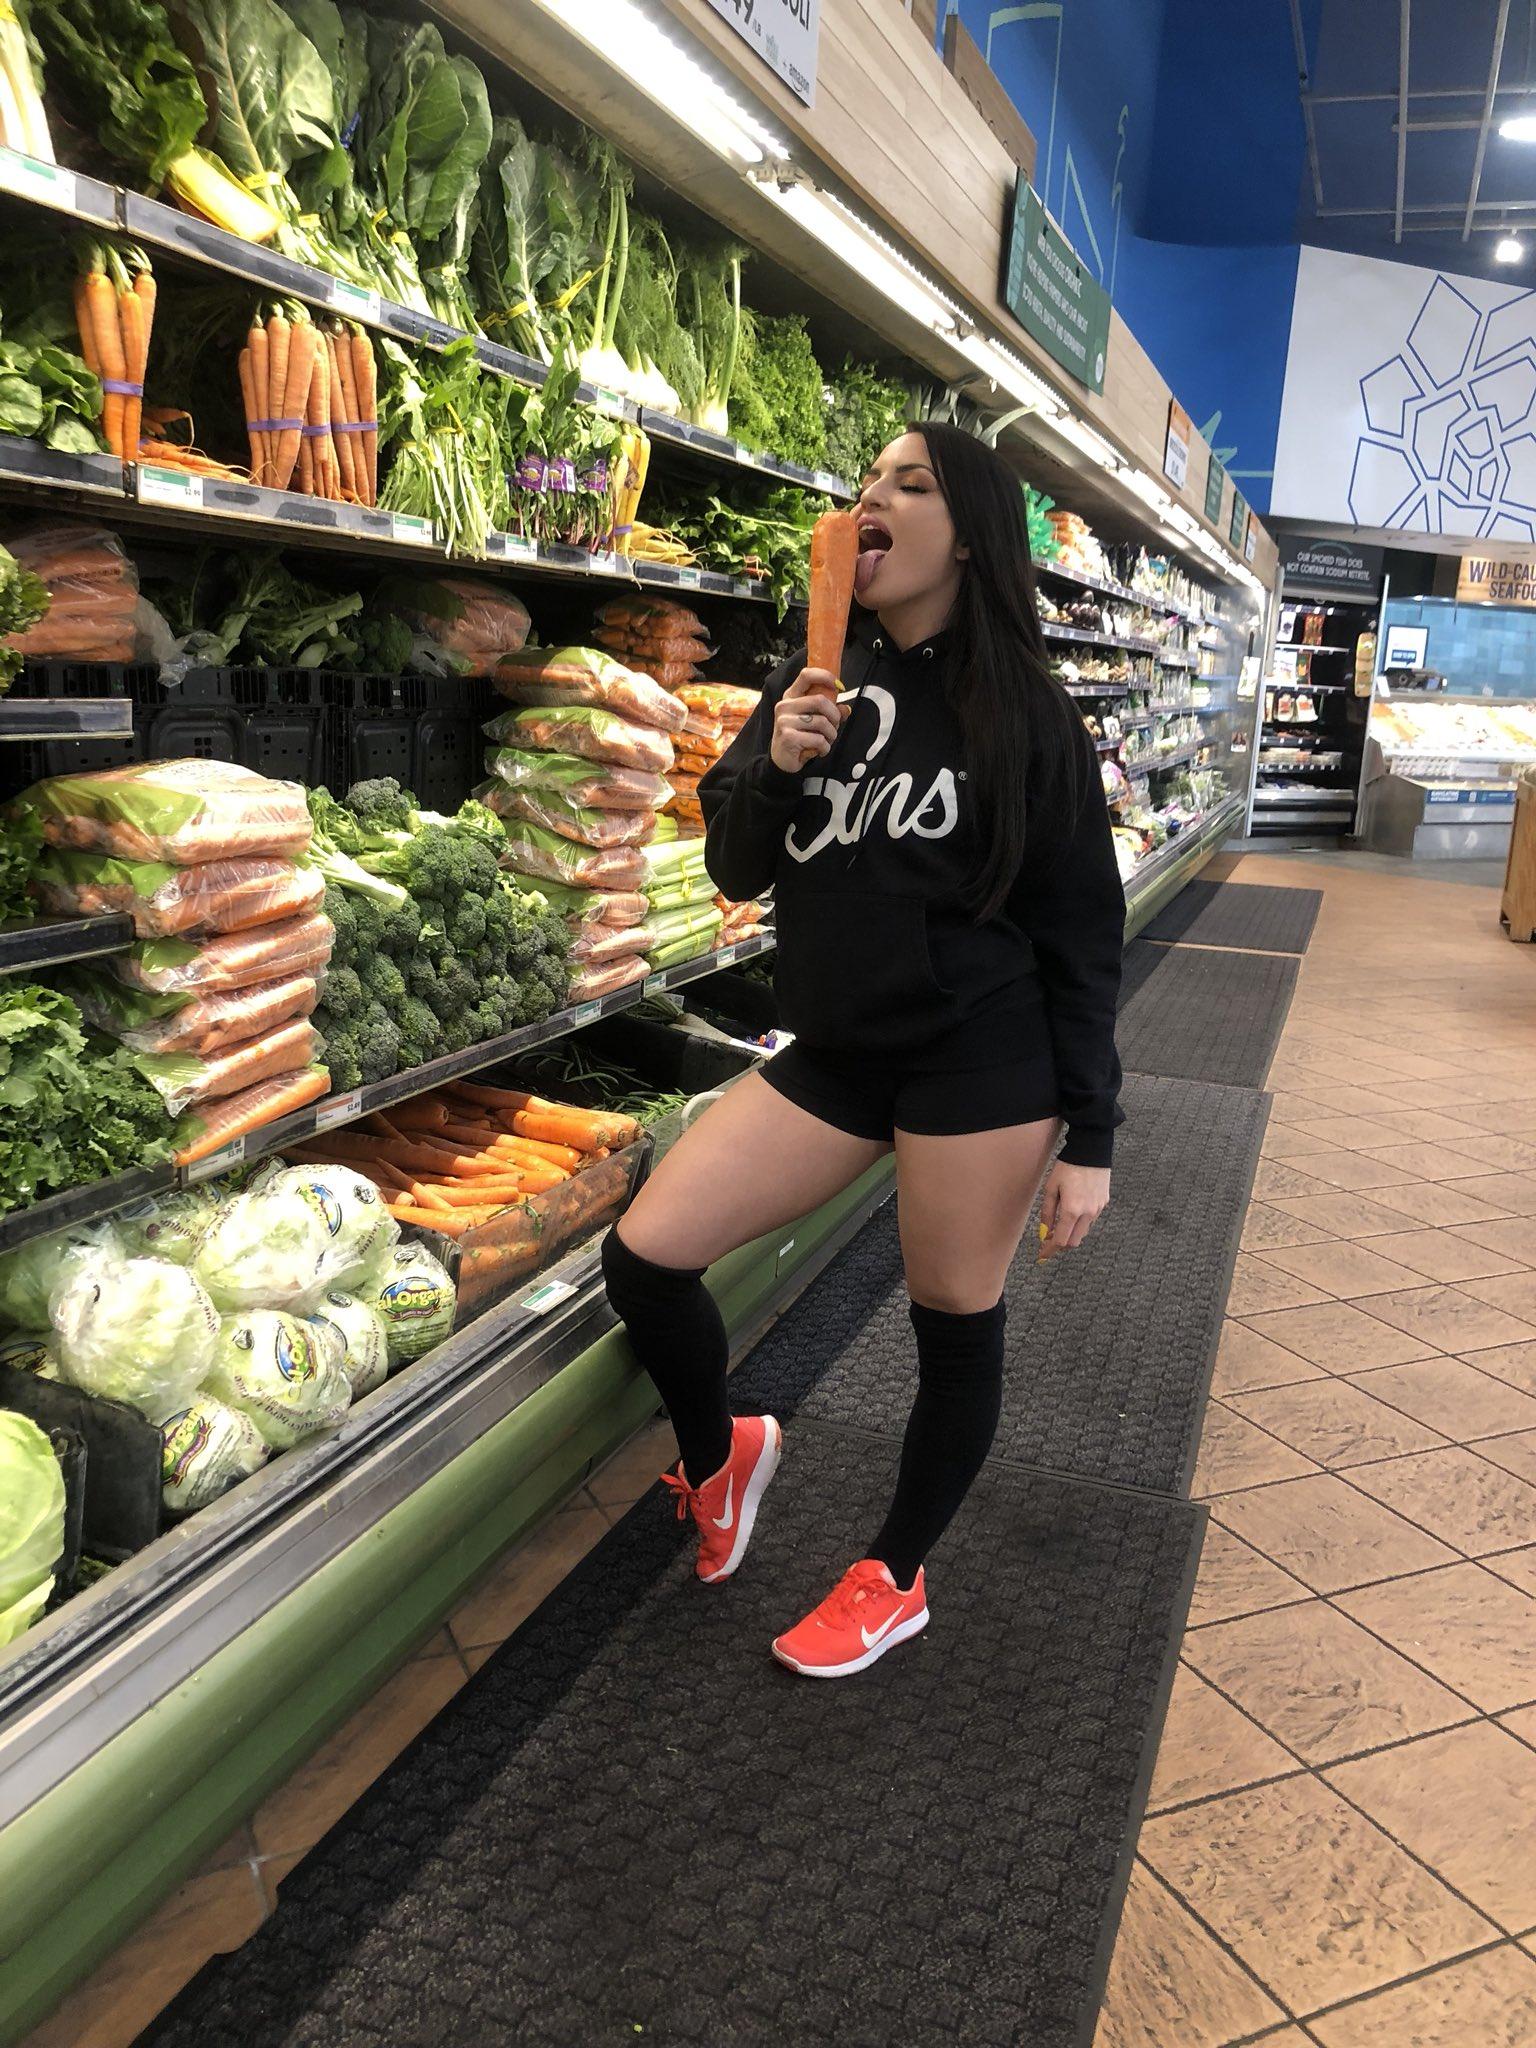 RT @ShopSinsLife: Whole Foods Sins style #shopsinslife @KissaSins https://t.co/upD3vrAail